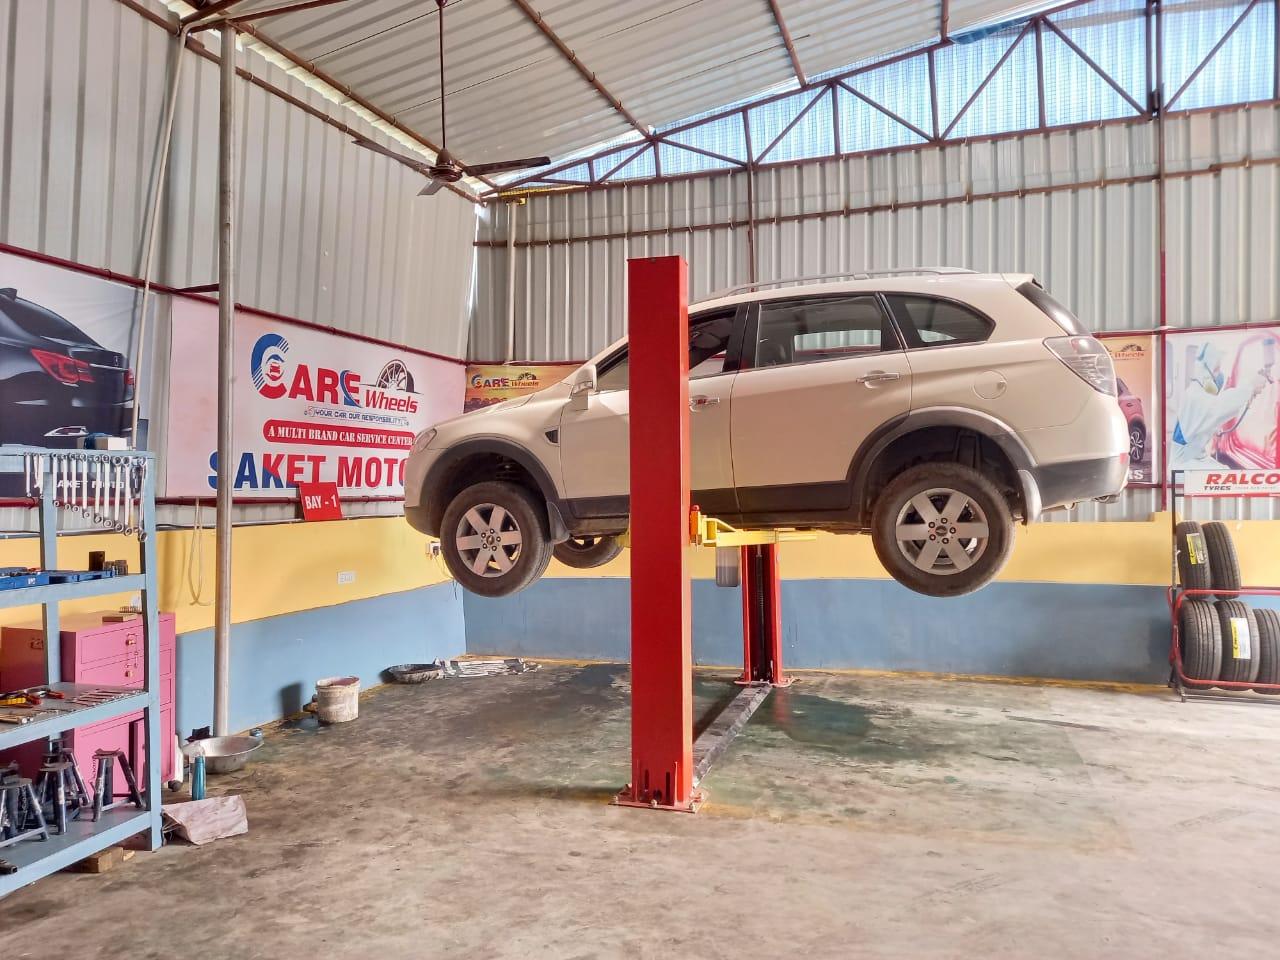 Care Wheels Saket Motors